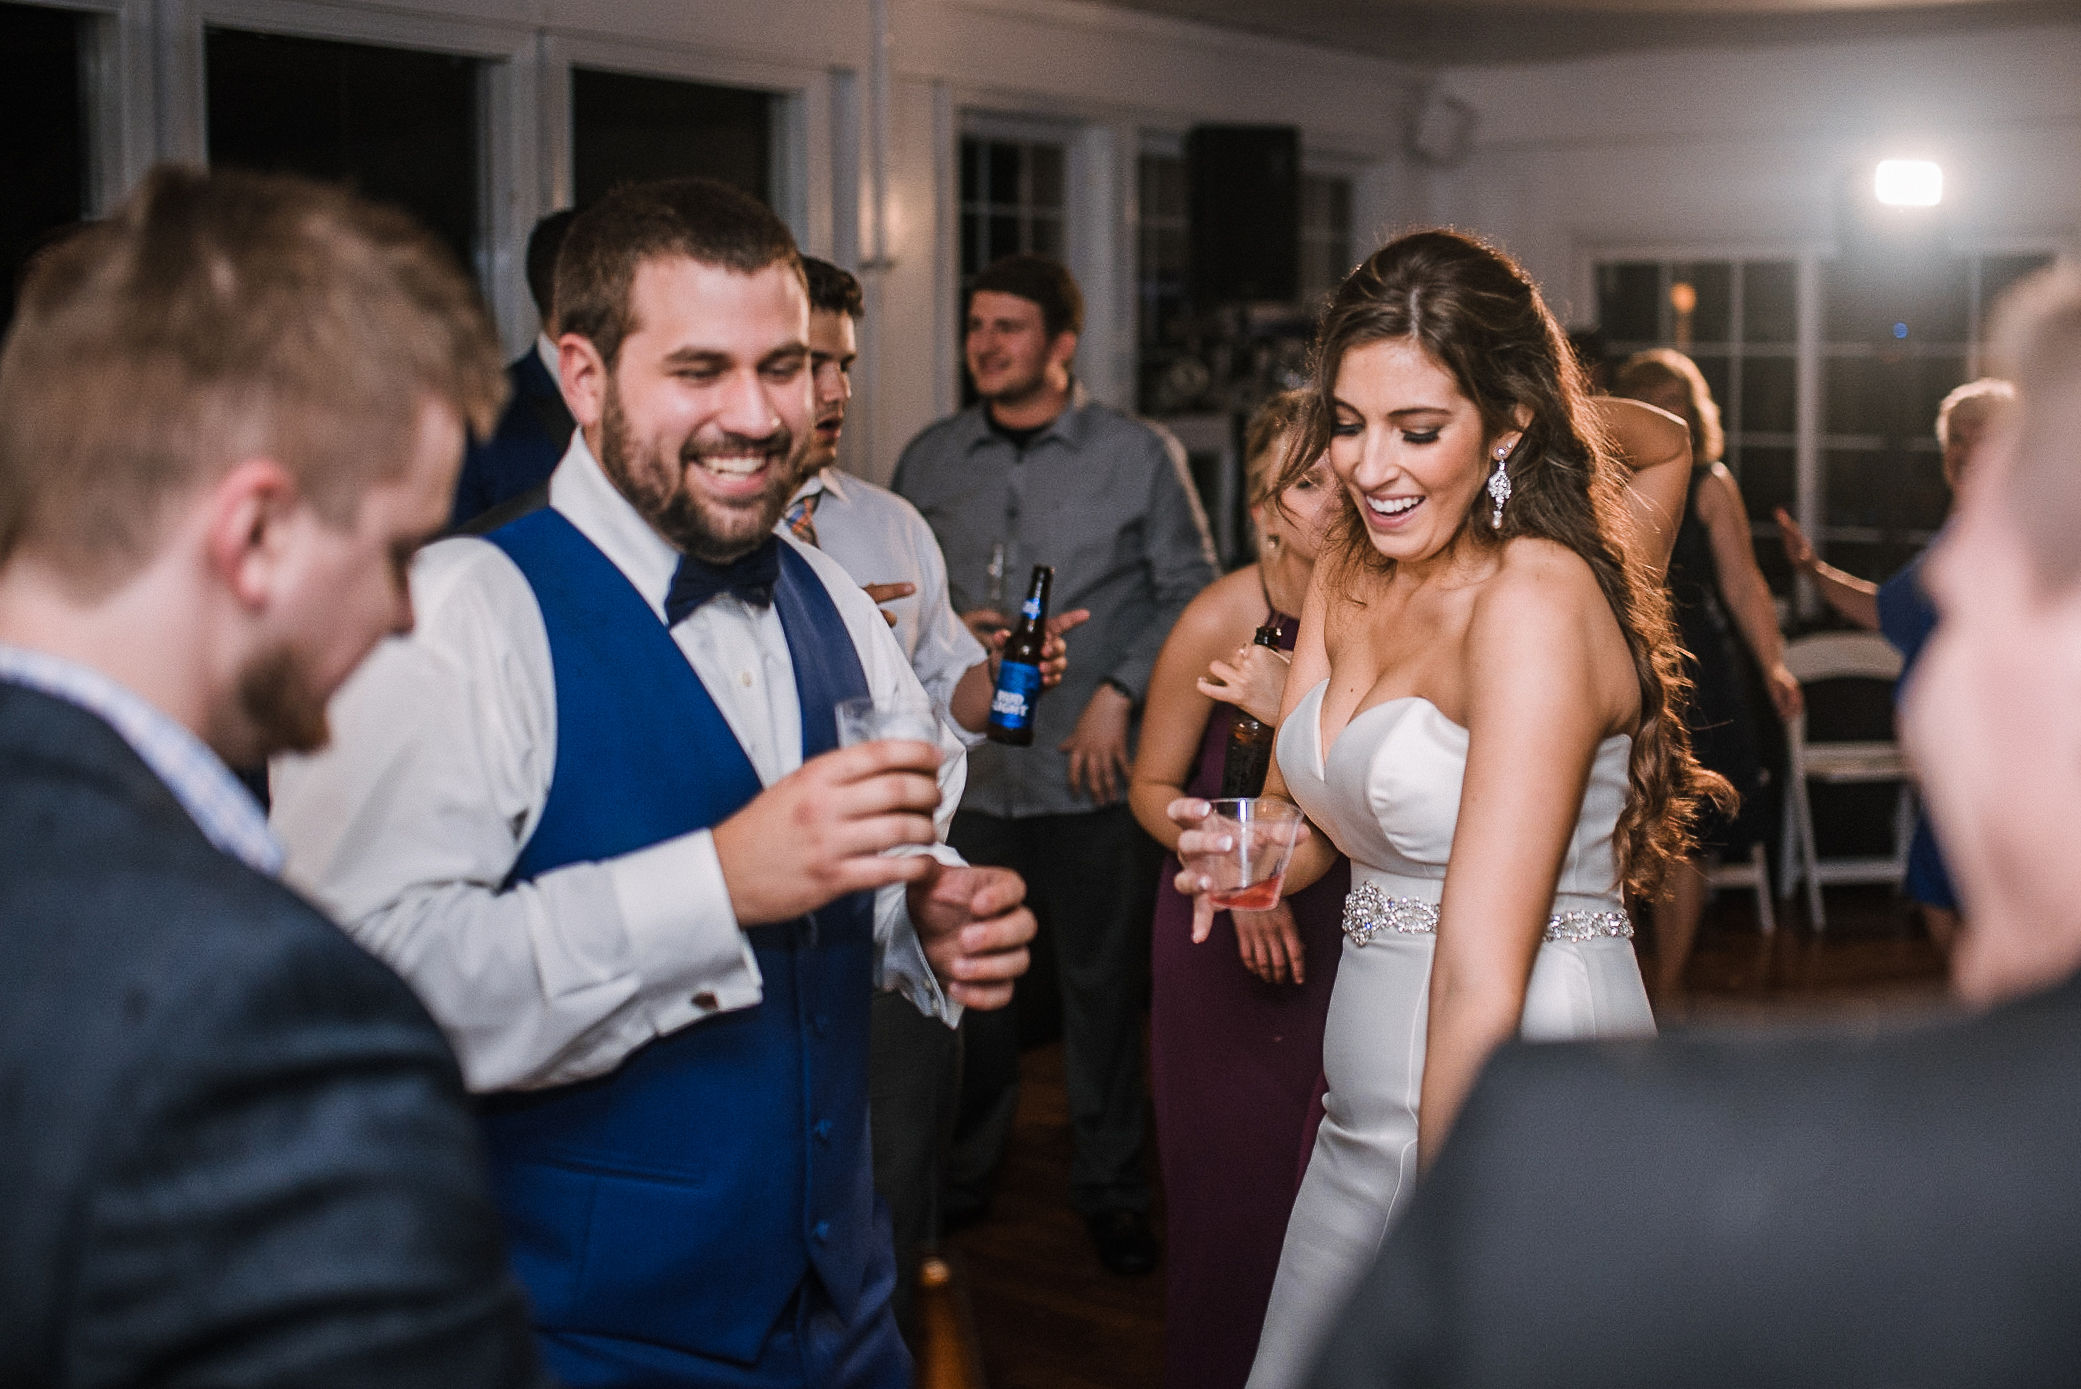 bride and groom dancing with guests at wedding reception at Seasons at Magnolia Manor